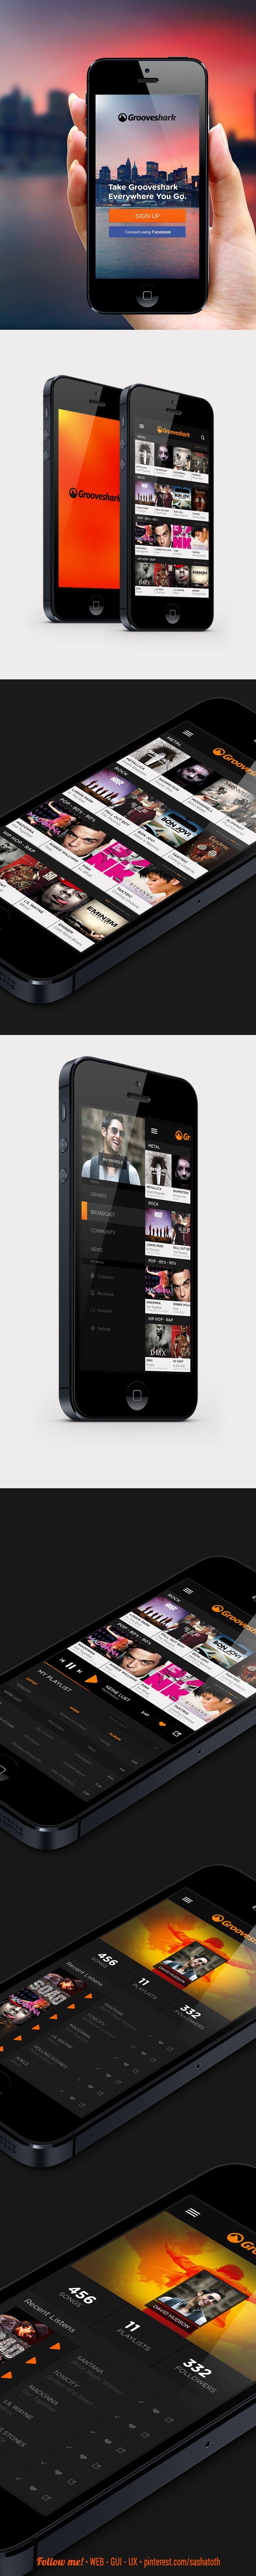 Grooveshark App Concept. by Enes Danış, via Behance *** #app #gui #ui #behance